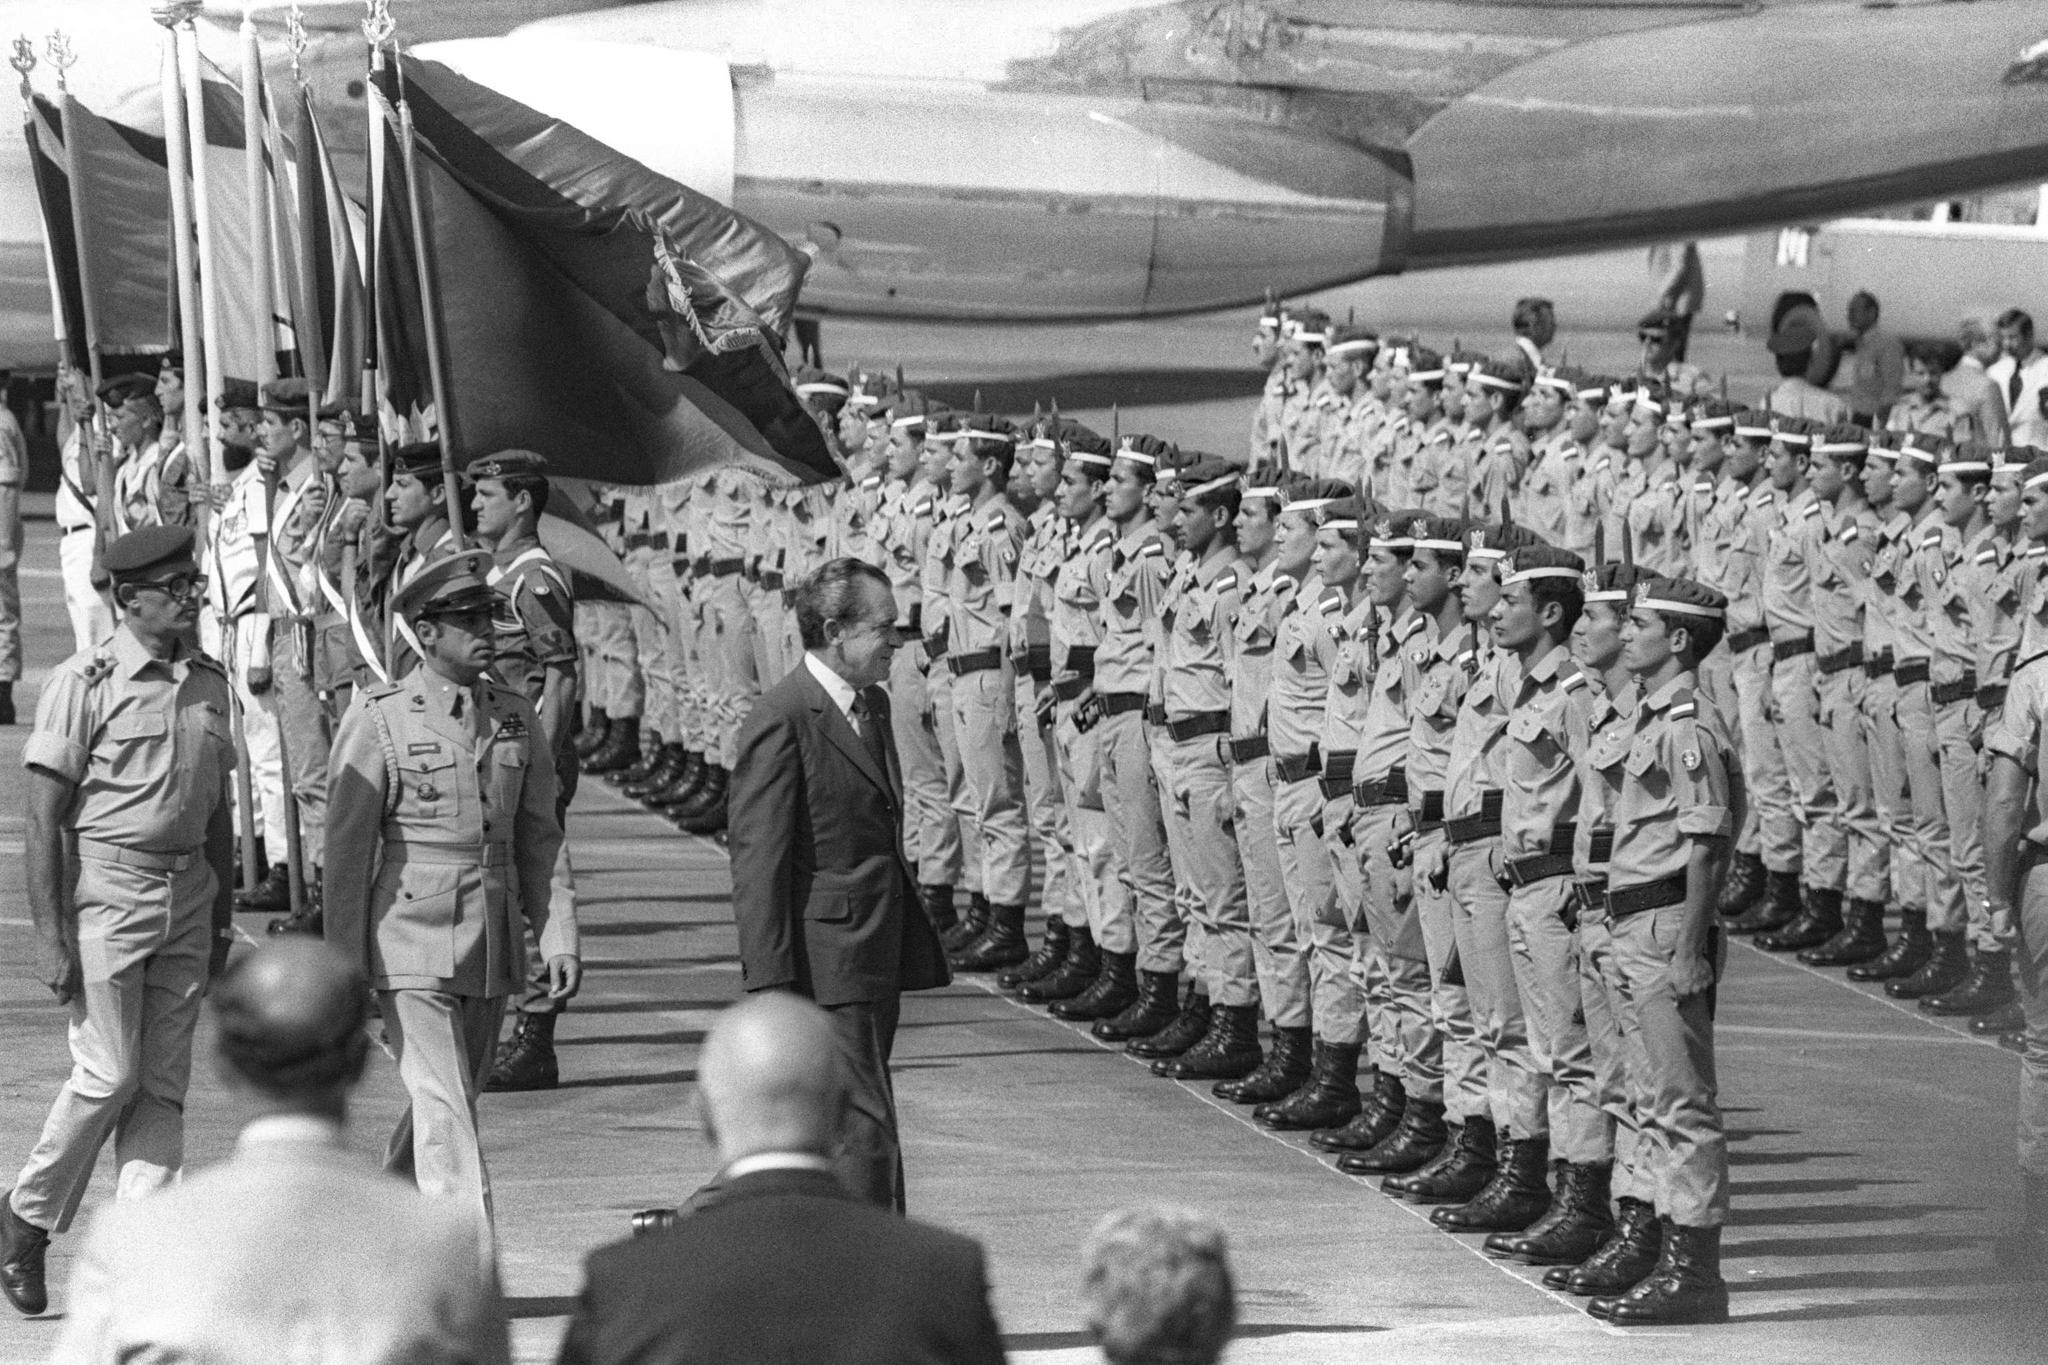 President Nixon walking past uniformed troops (State Dept.)